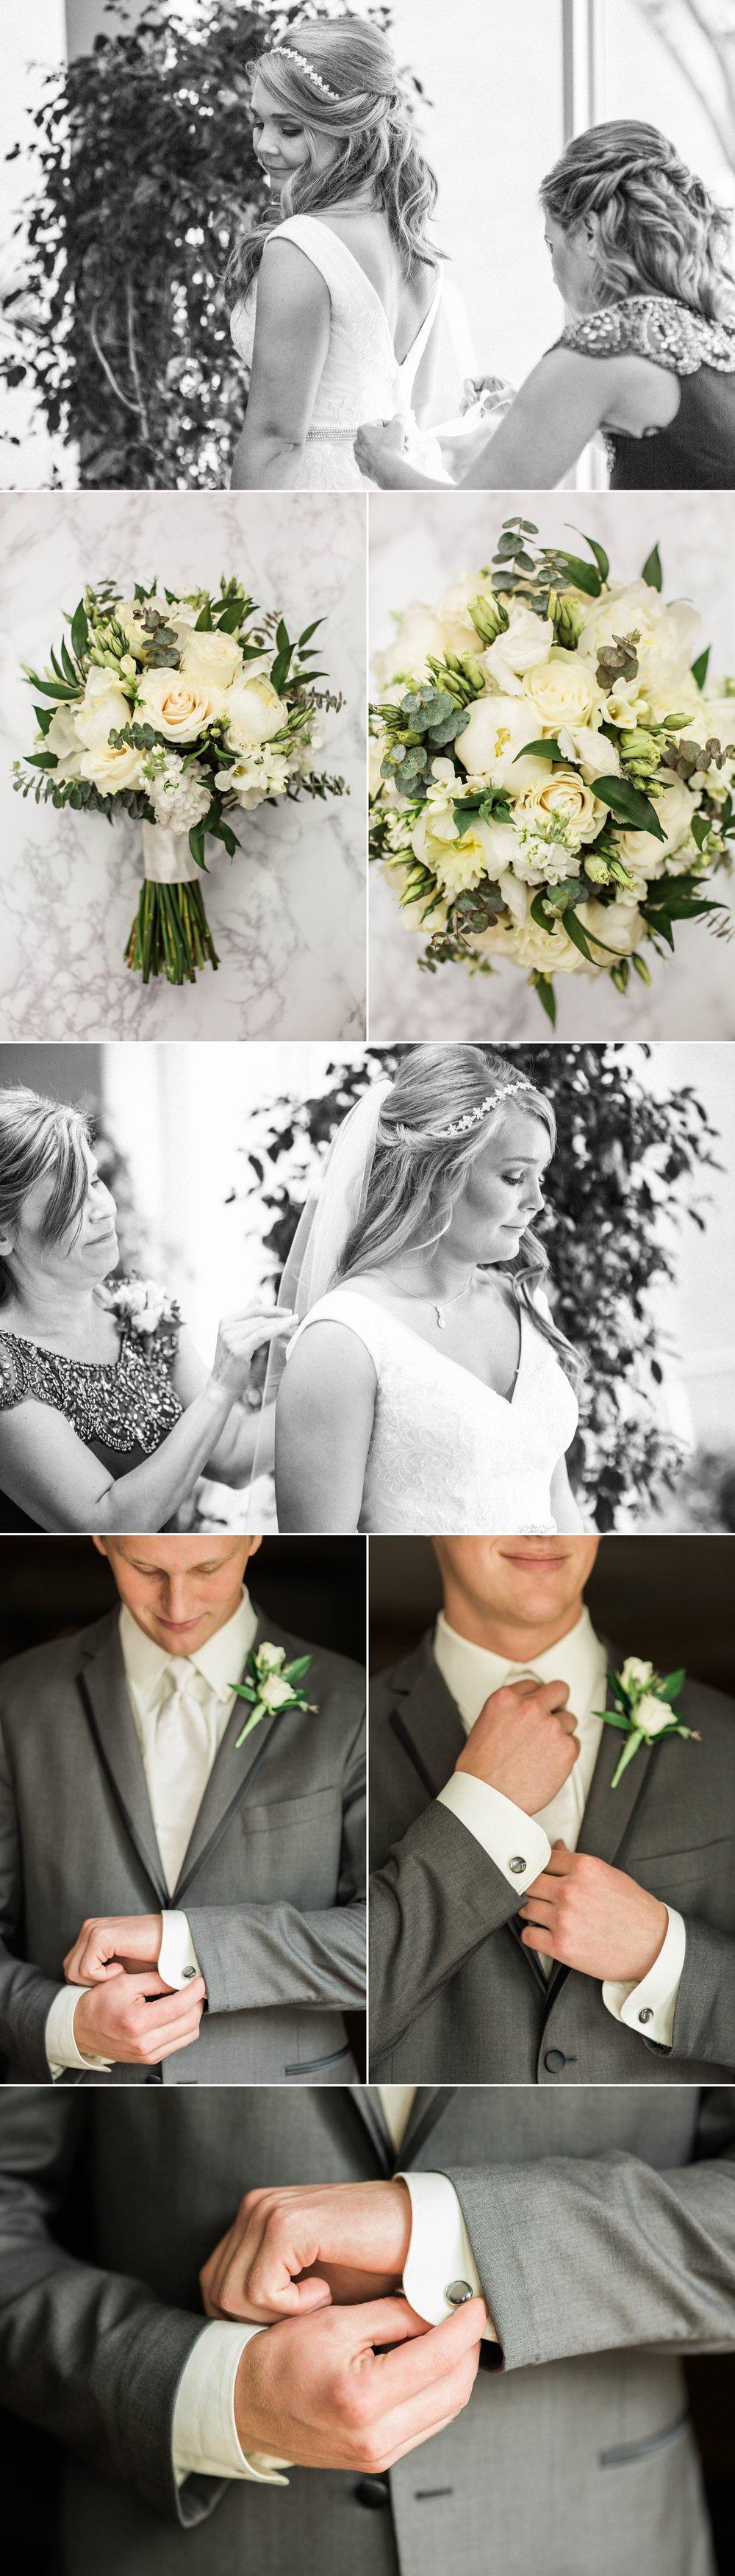 wedding - ceremony - bride - fort wayne - indiana - groom - flowers - bouquet